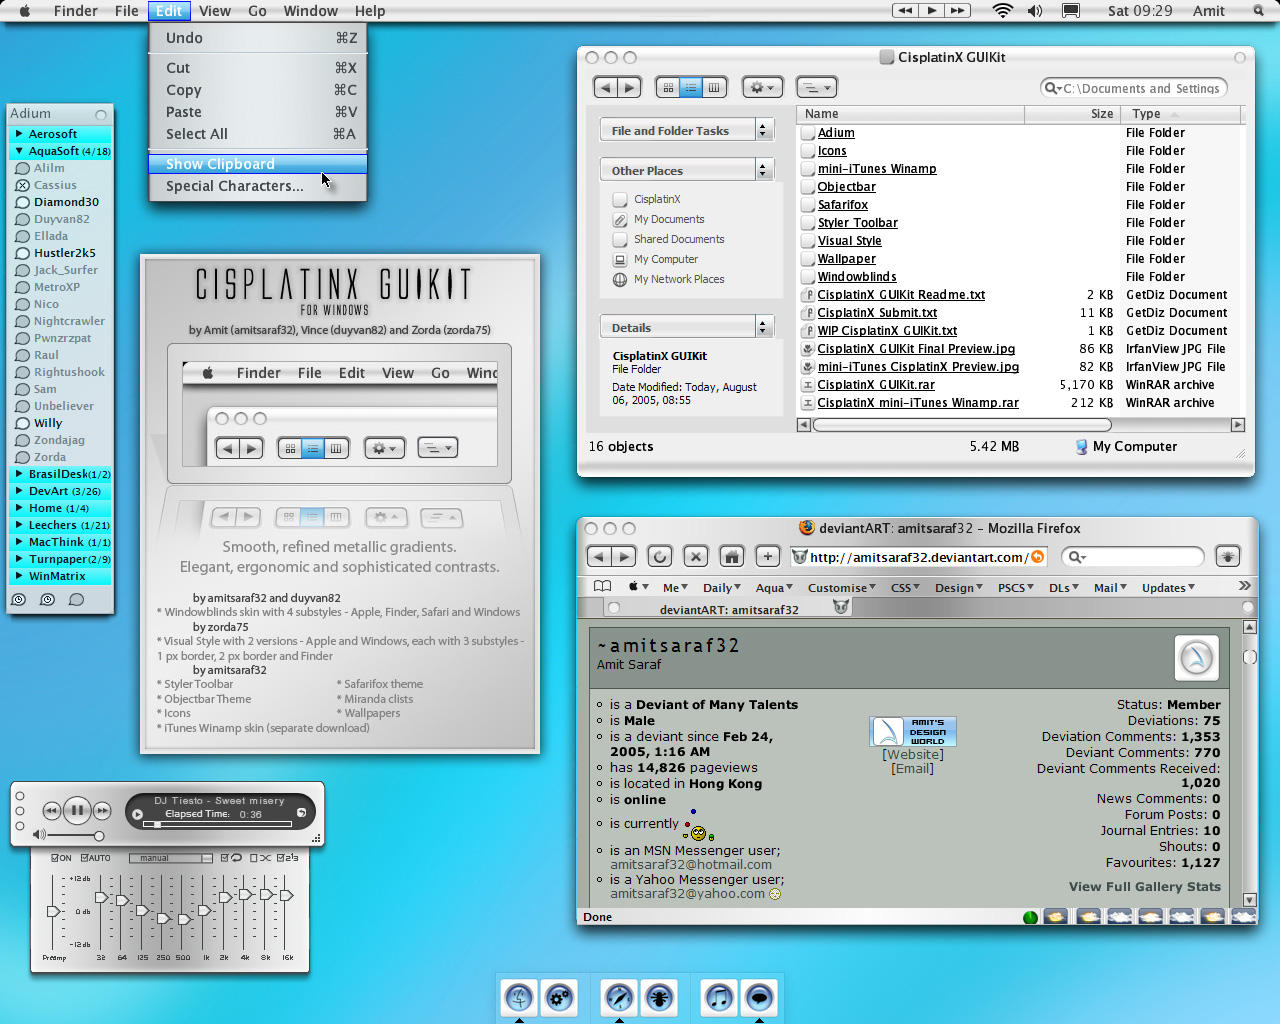 CisplatinX GUIKit for Windows by amitsaraf32